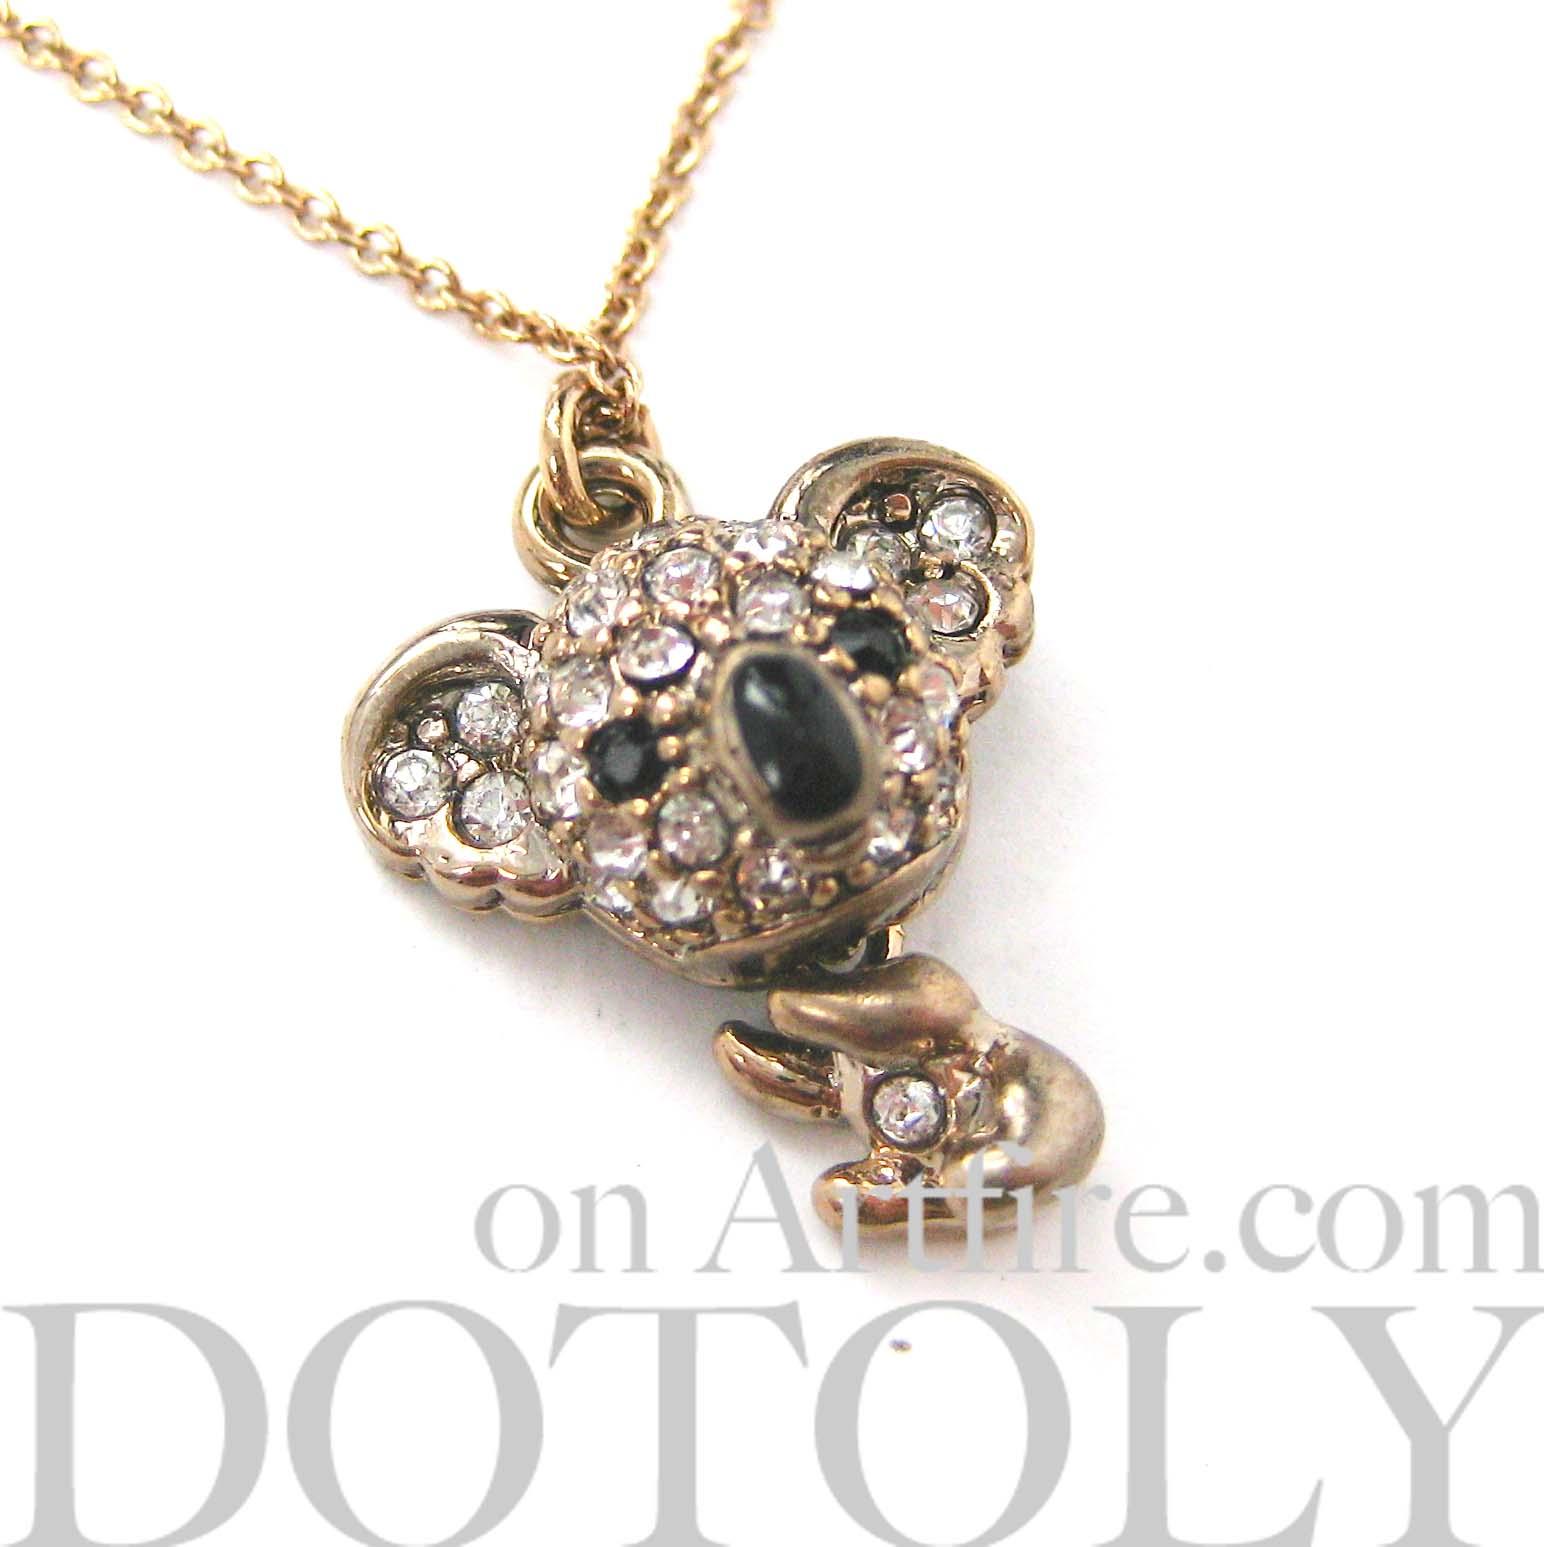 small koala teddy animal charm necklace in